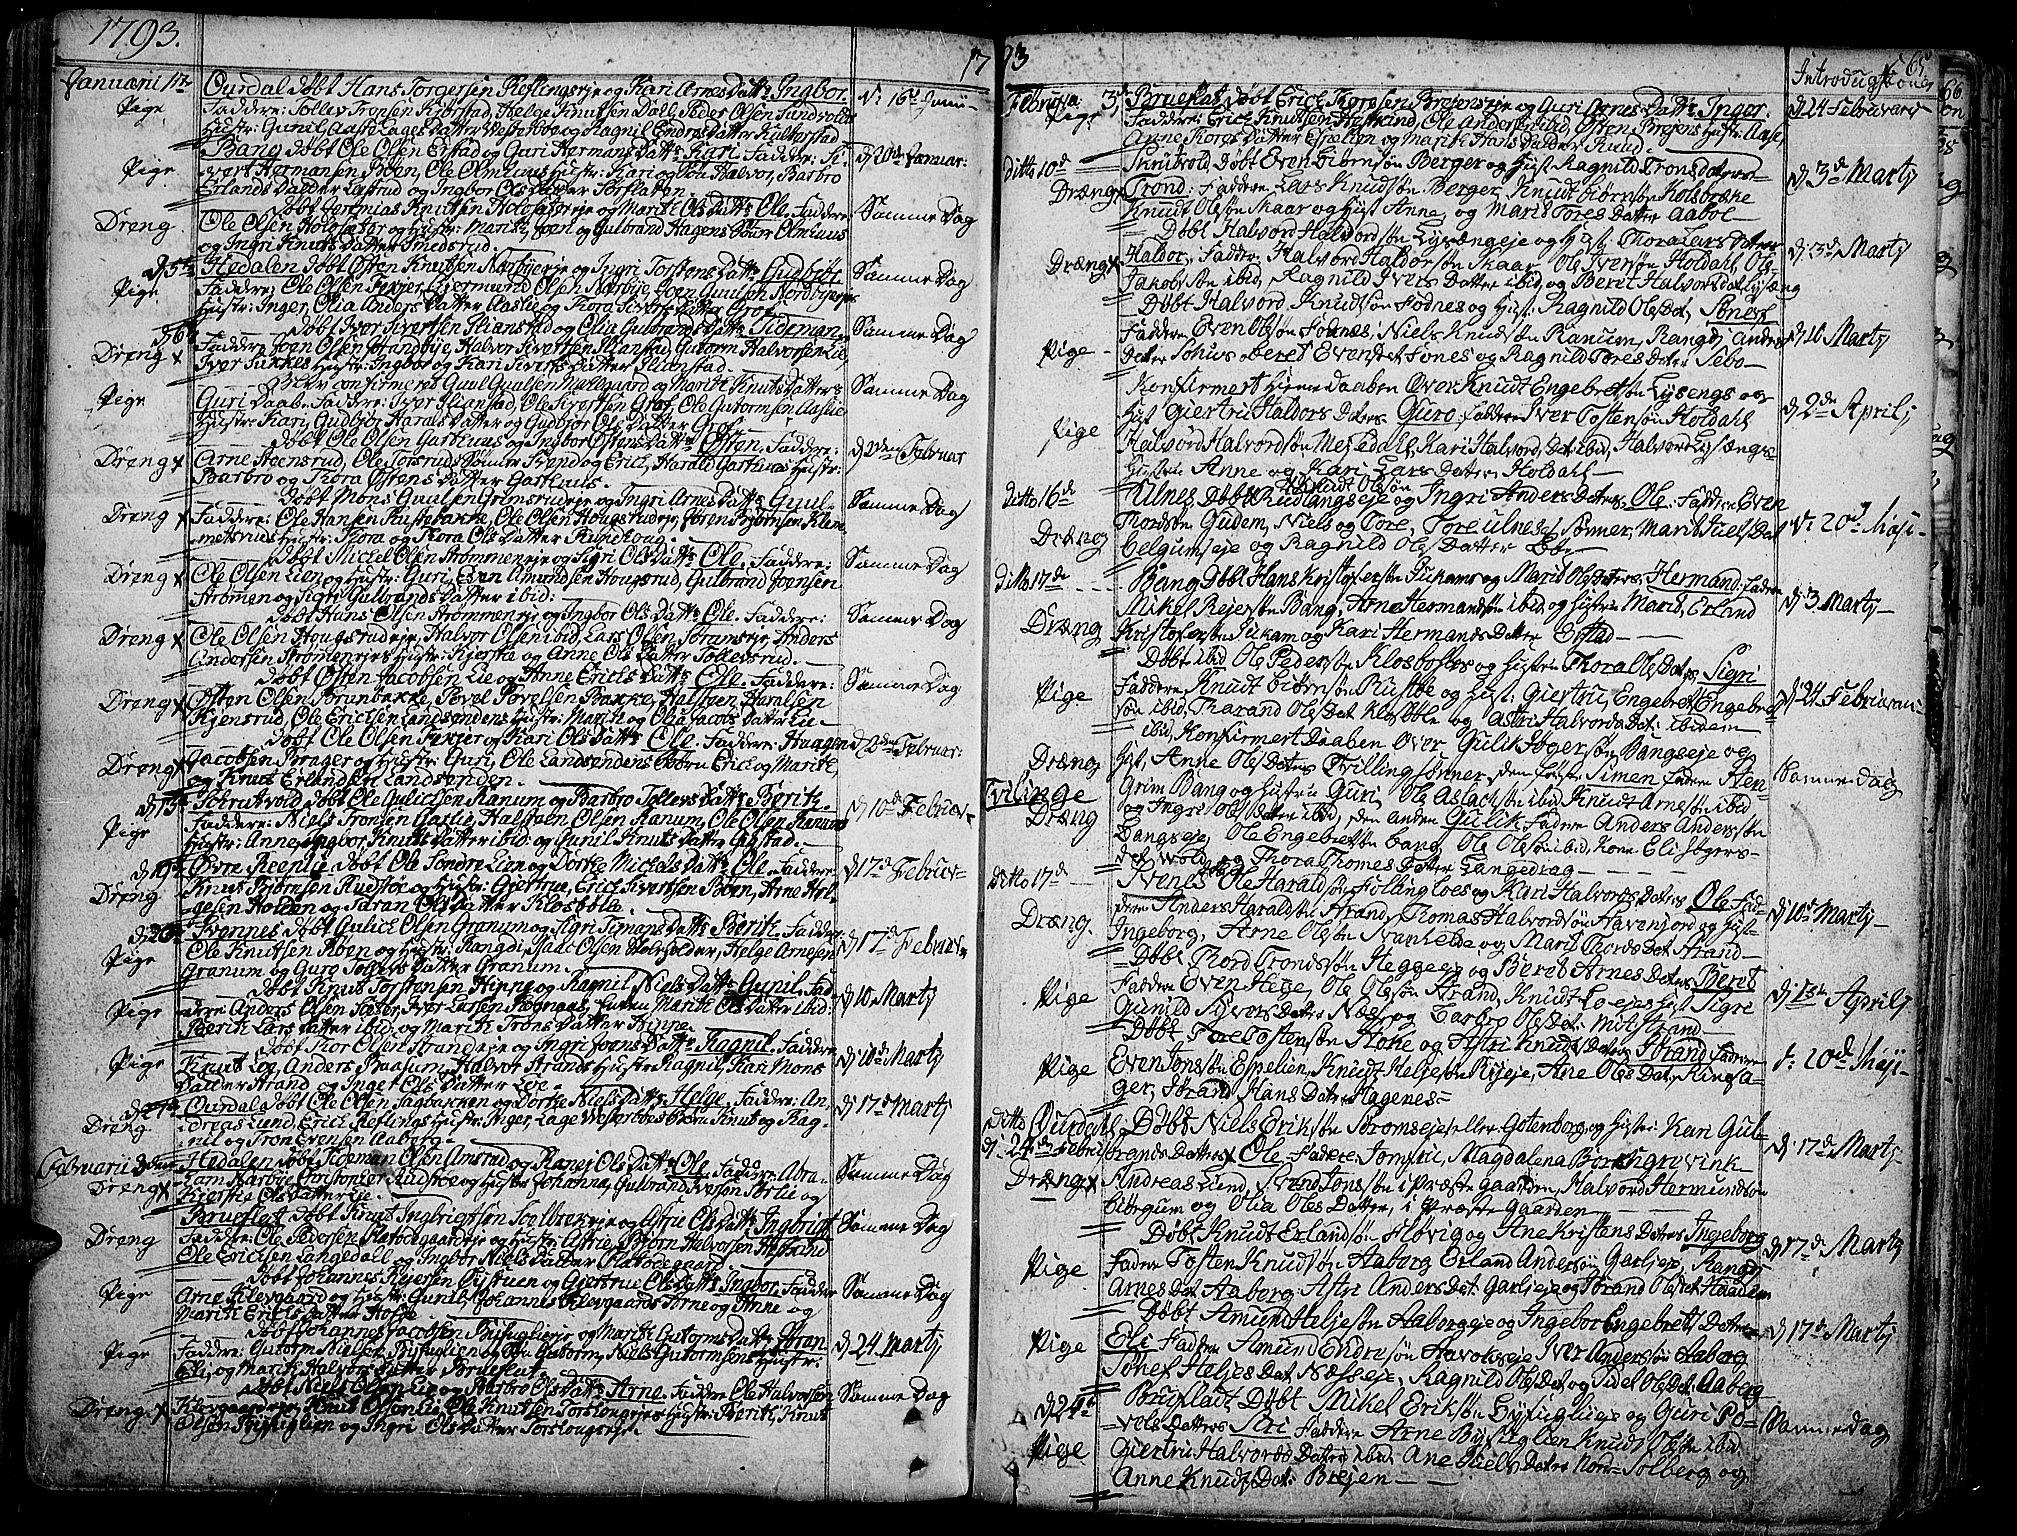 SAH, Aurdal prestekontor, Ministerialbok nr. 6, 1781-1804, s. 65